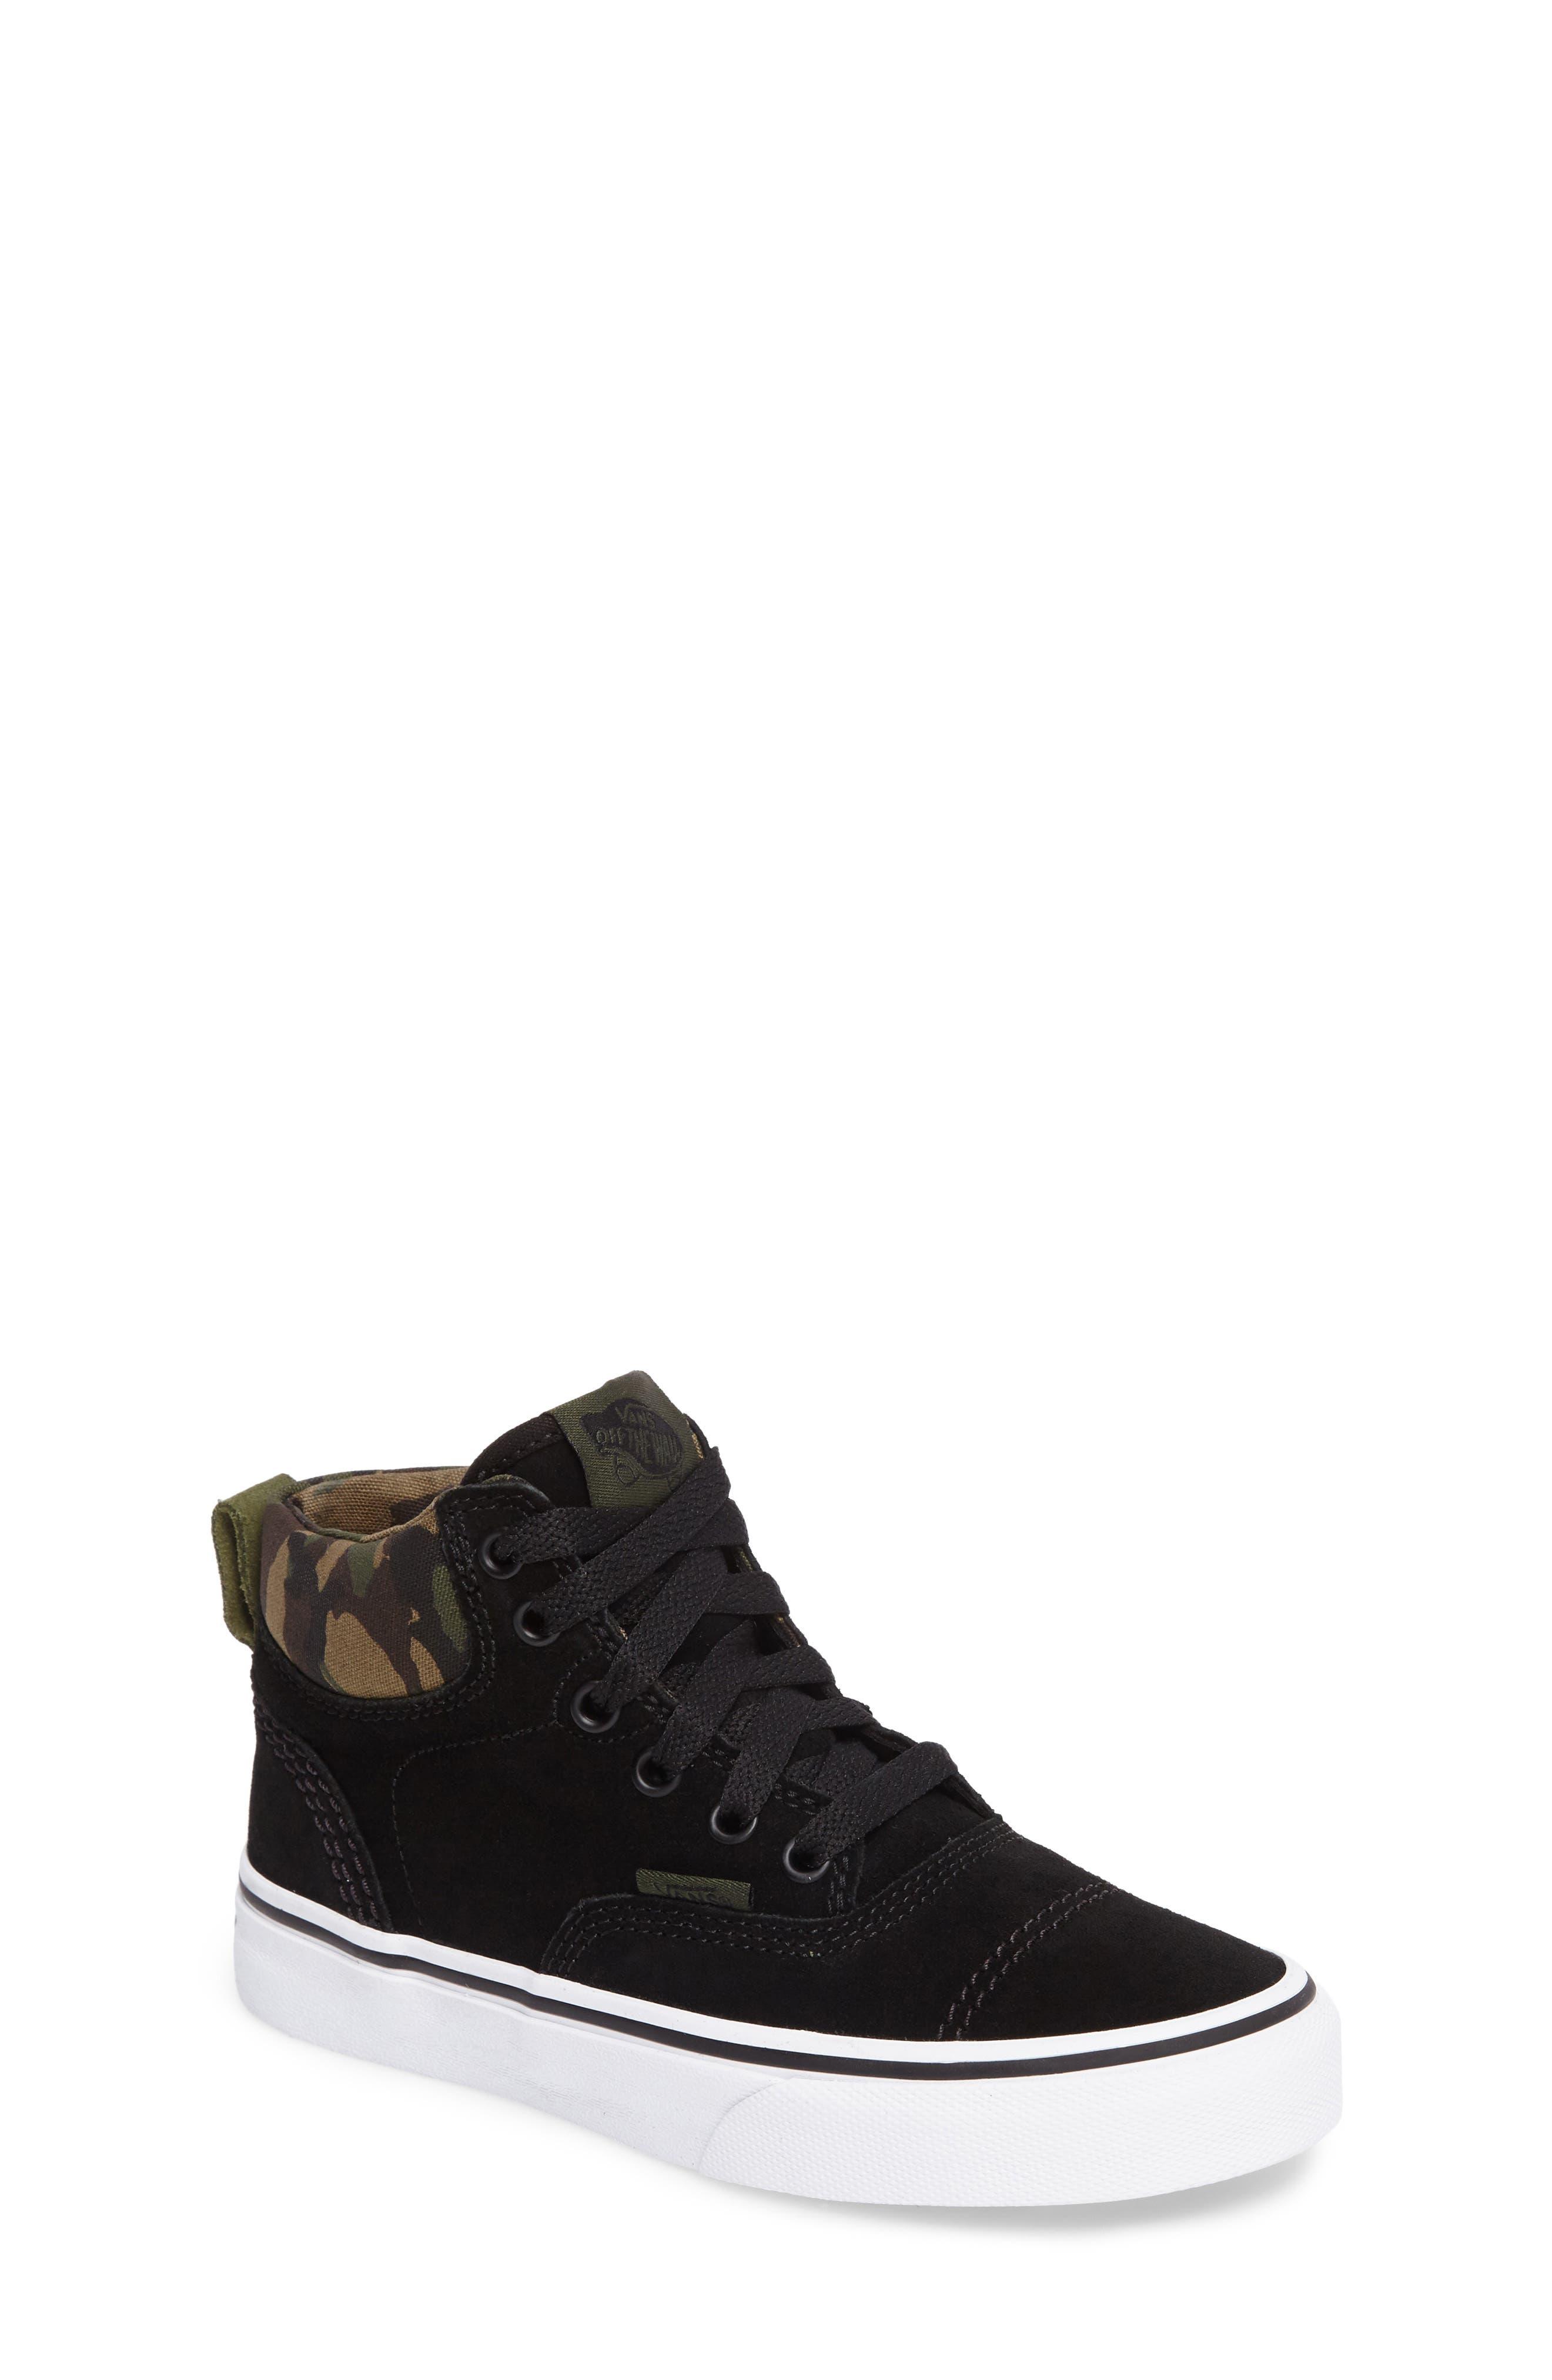 Era - Hi Sneaker,                             Main thumbnail 1, color,                             Classic Camo/ Black Suede